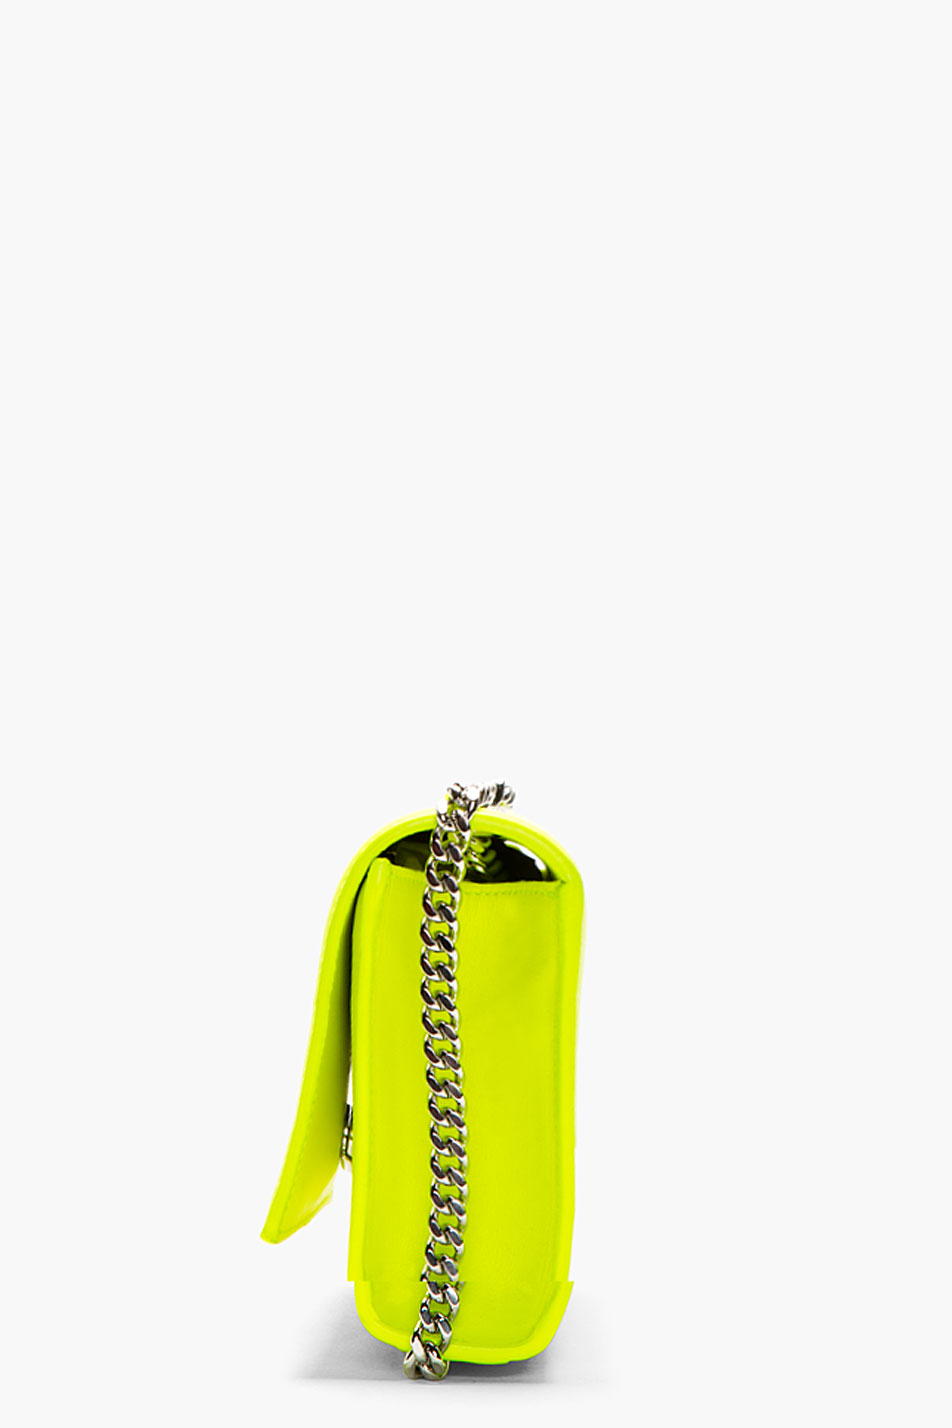 4569e53195 Saint Laurent Neon Yellow Leather Monogram Shoulder Bag in Yellow - Lyst